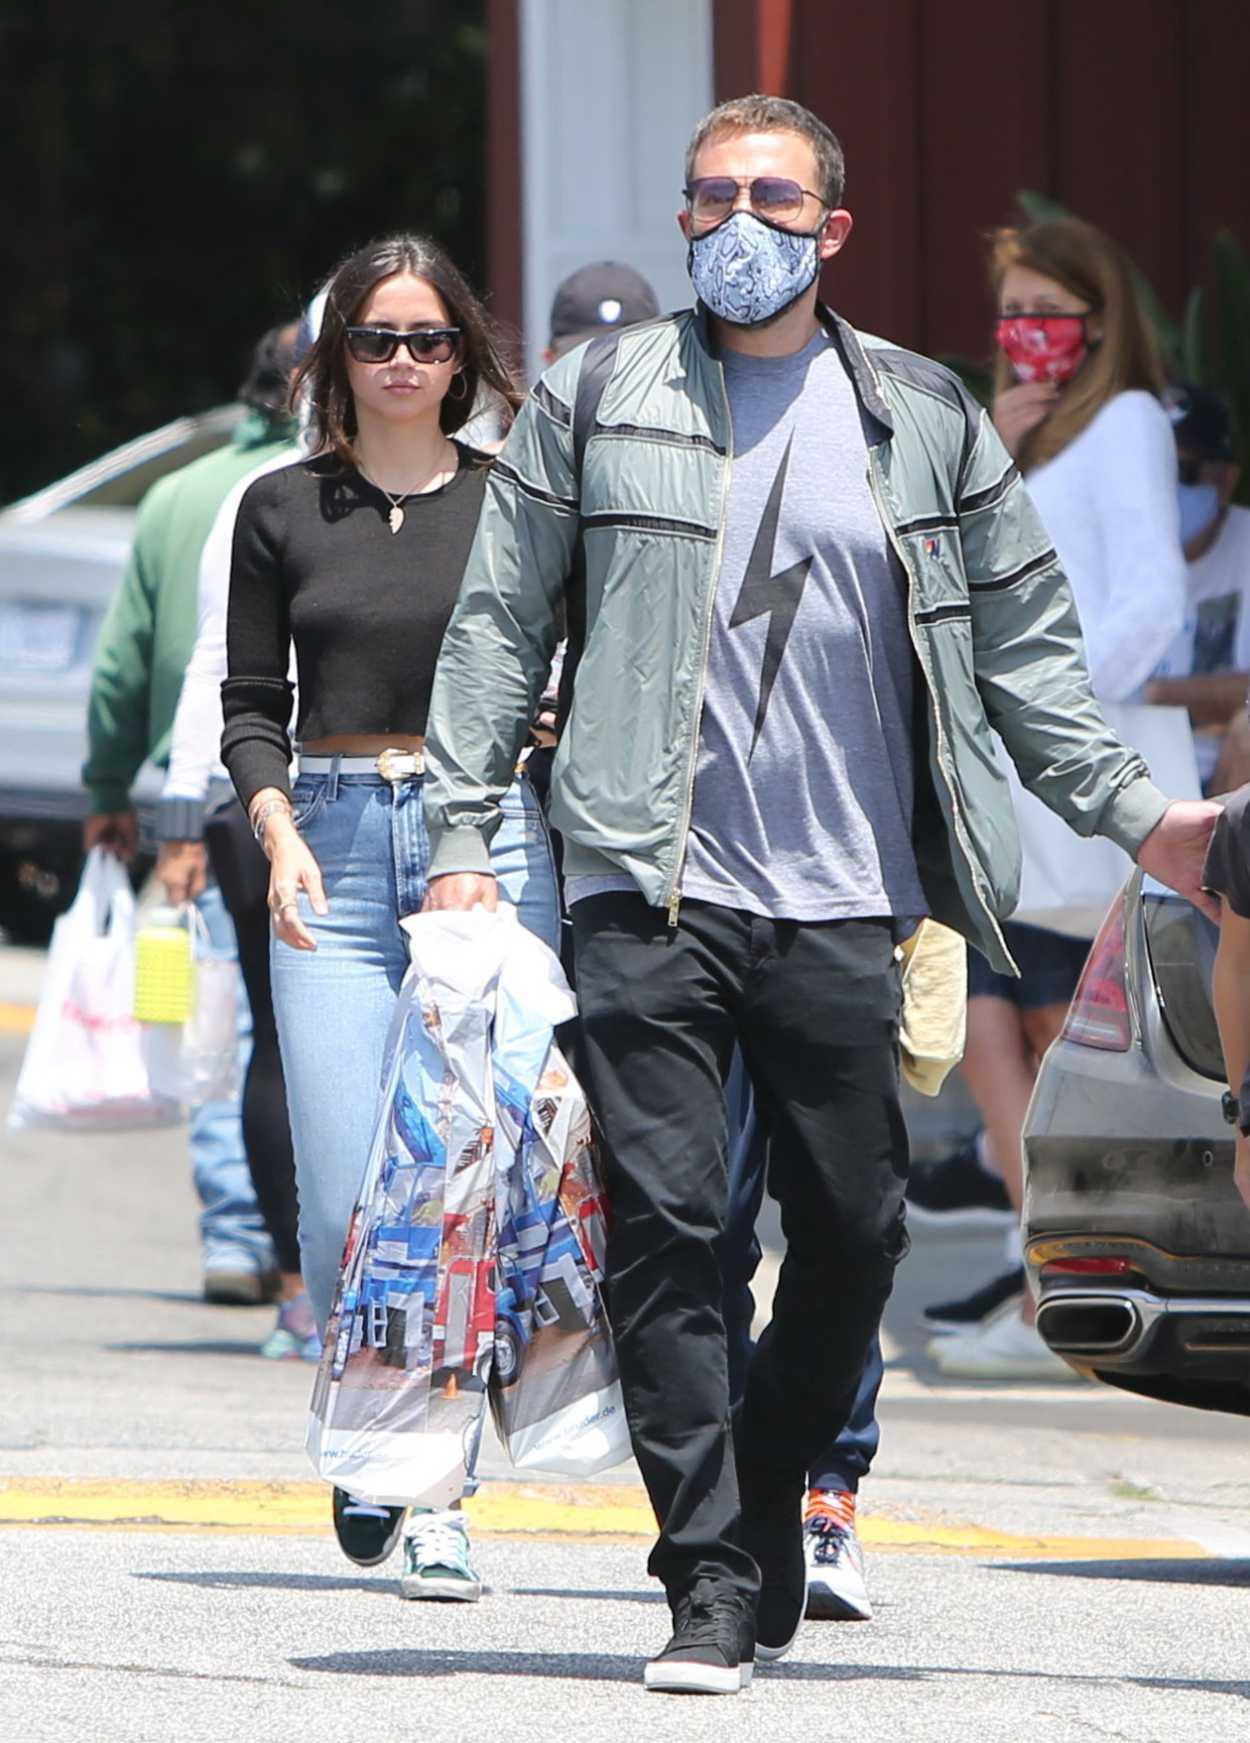 Ana De Armas in a Blue Ripped Jeans